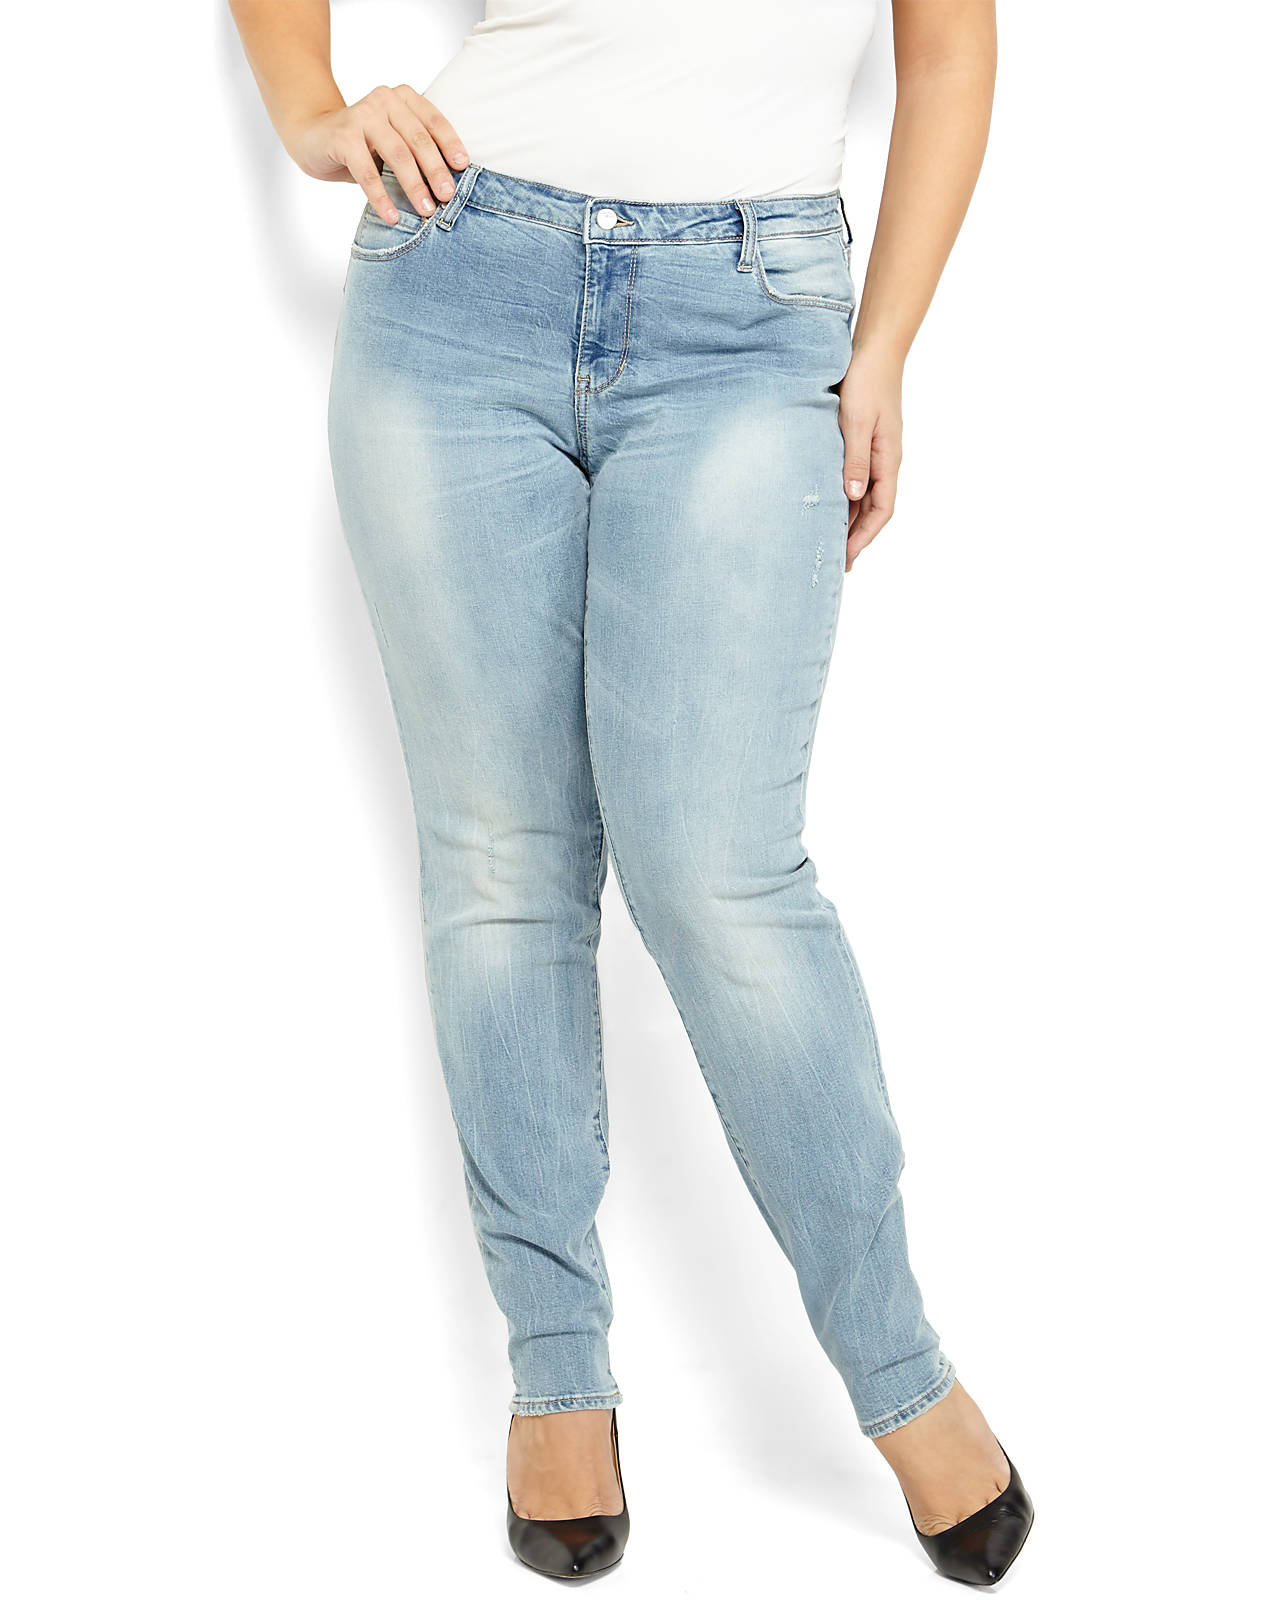 Dkny Plus Size Light Wash Mercer Skinny Jeans in Blue | Lyst